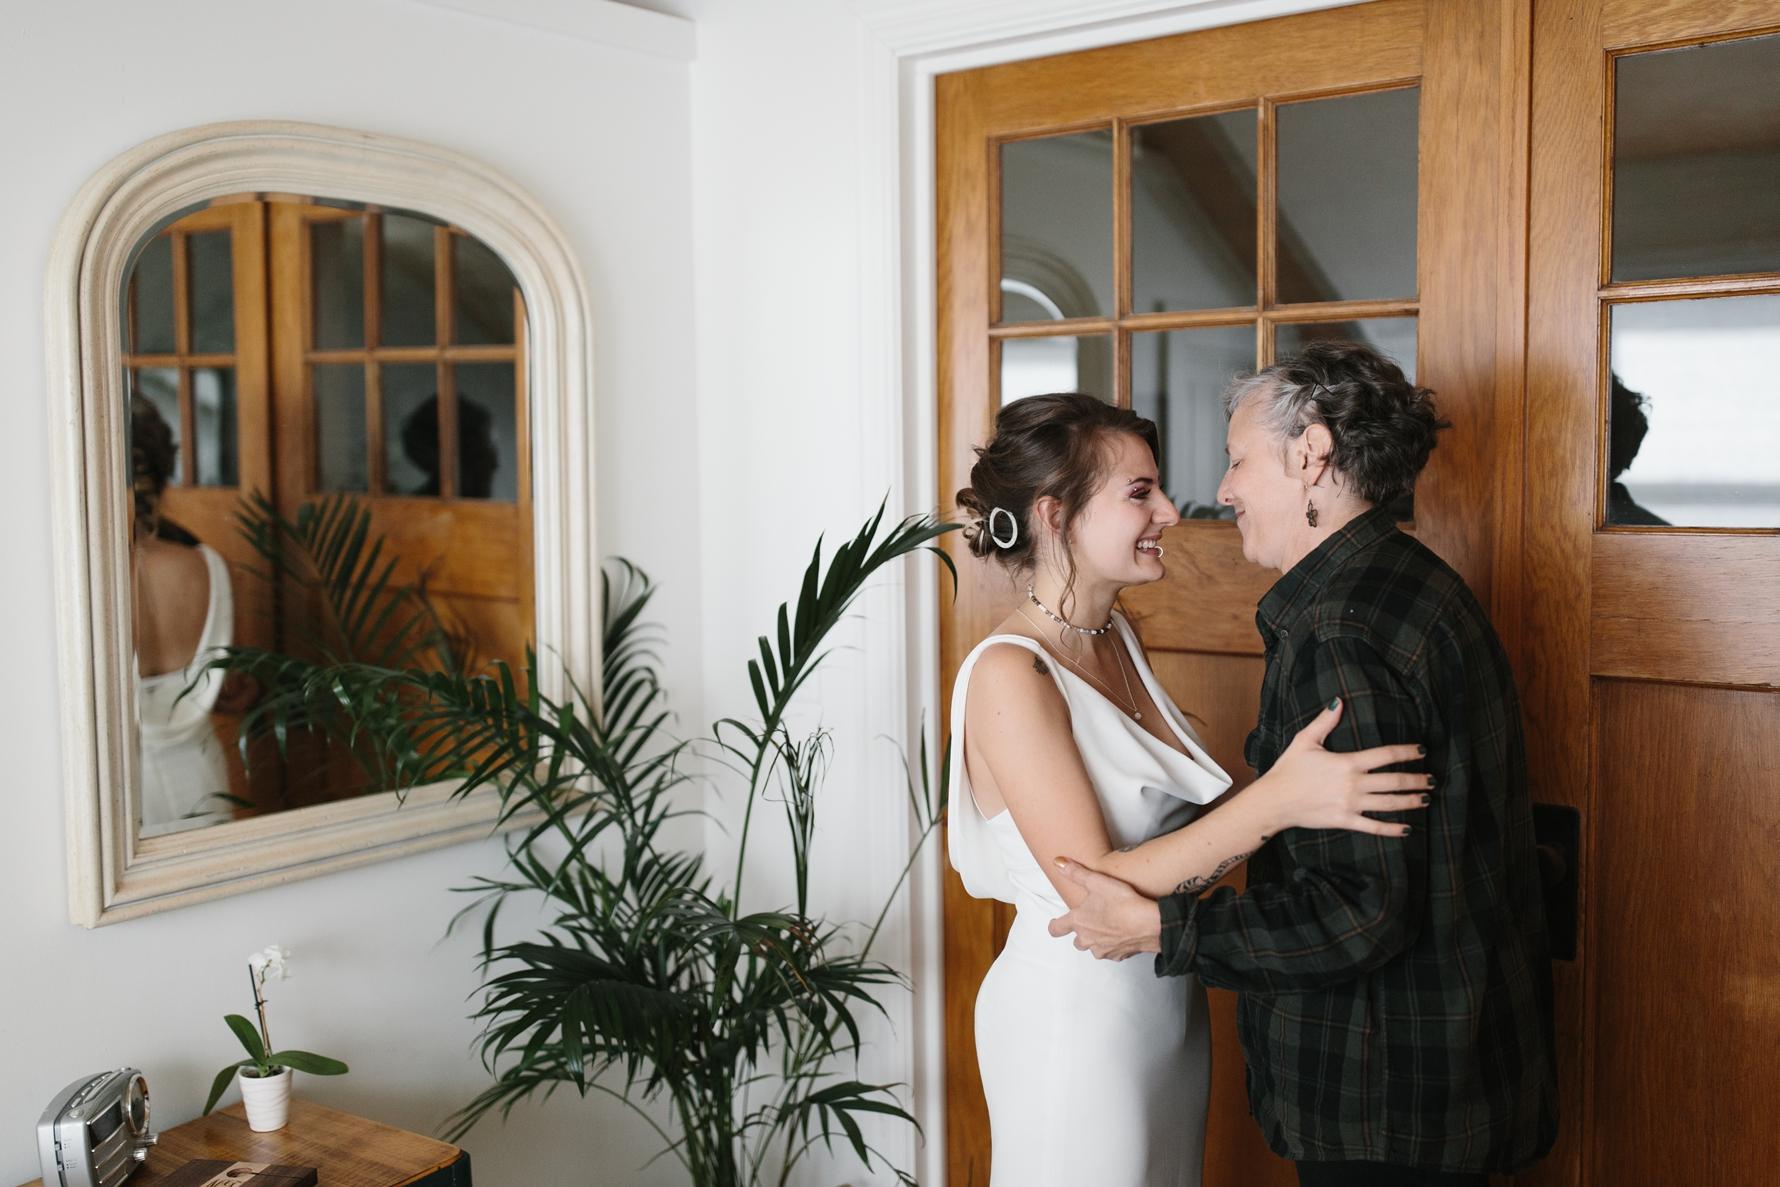 norris-traverse-city-wedding-09.JPG